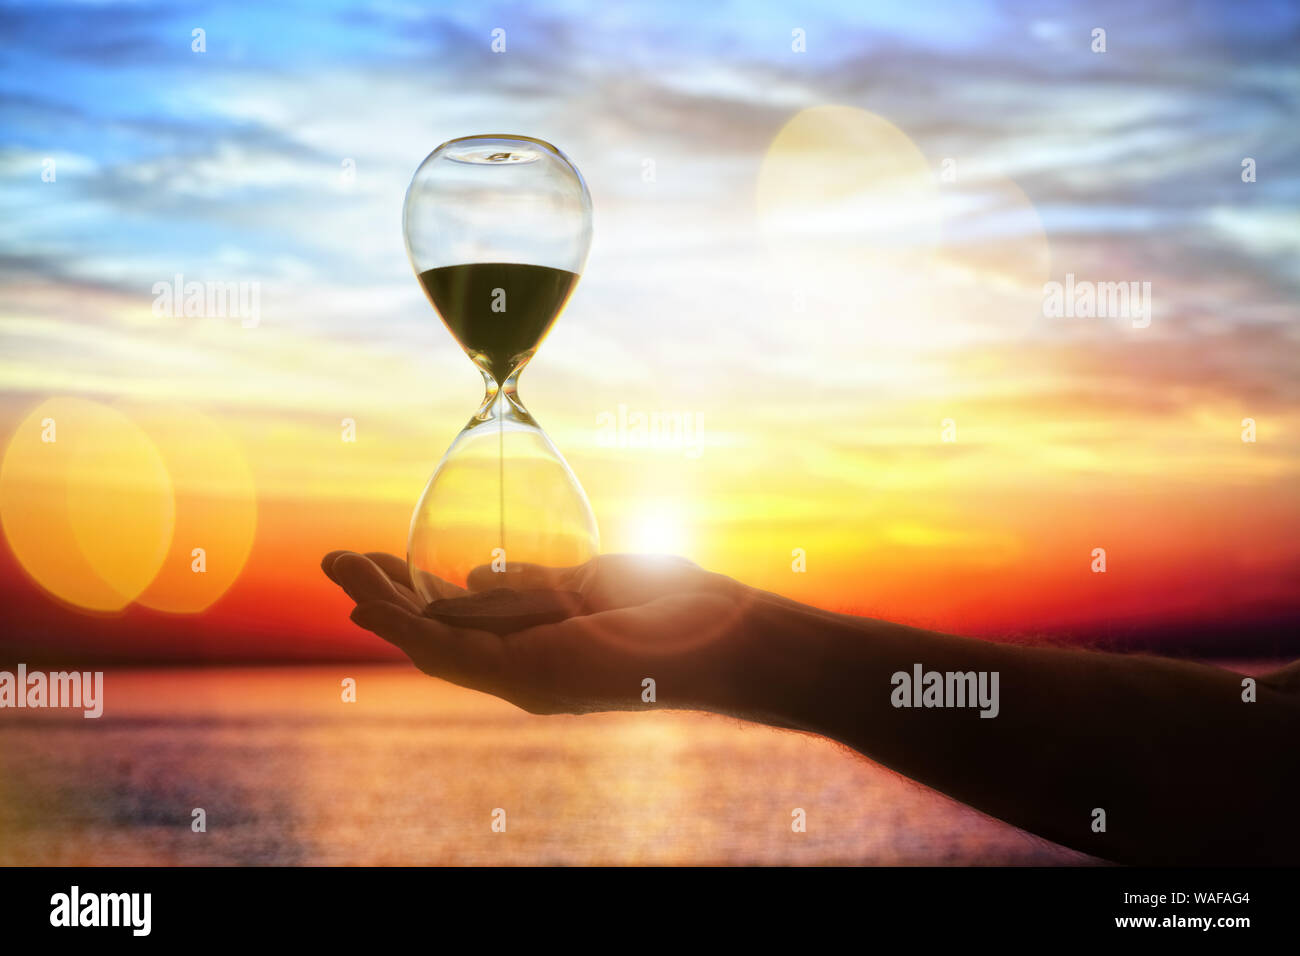 Temps Hourglass à fond coucher with copy space Banque D'Images